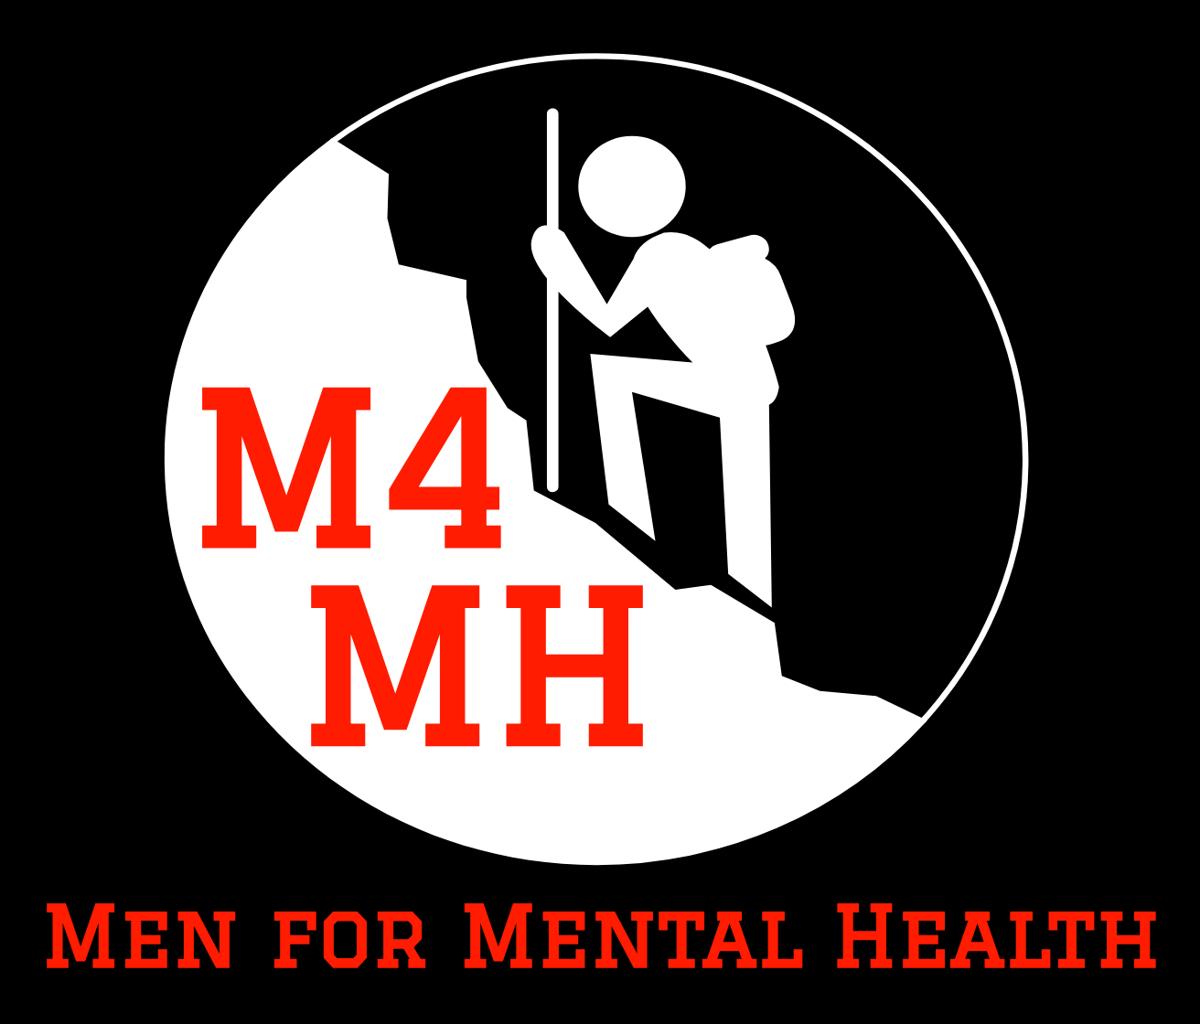 Men for Mental Health